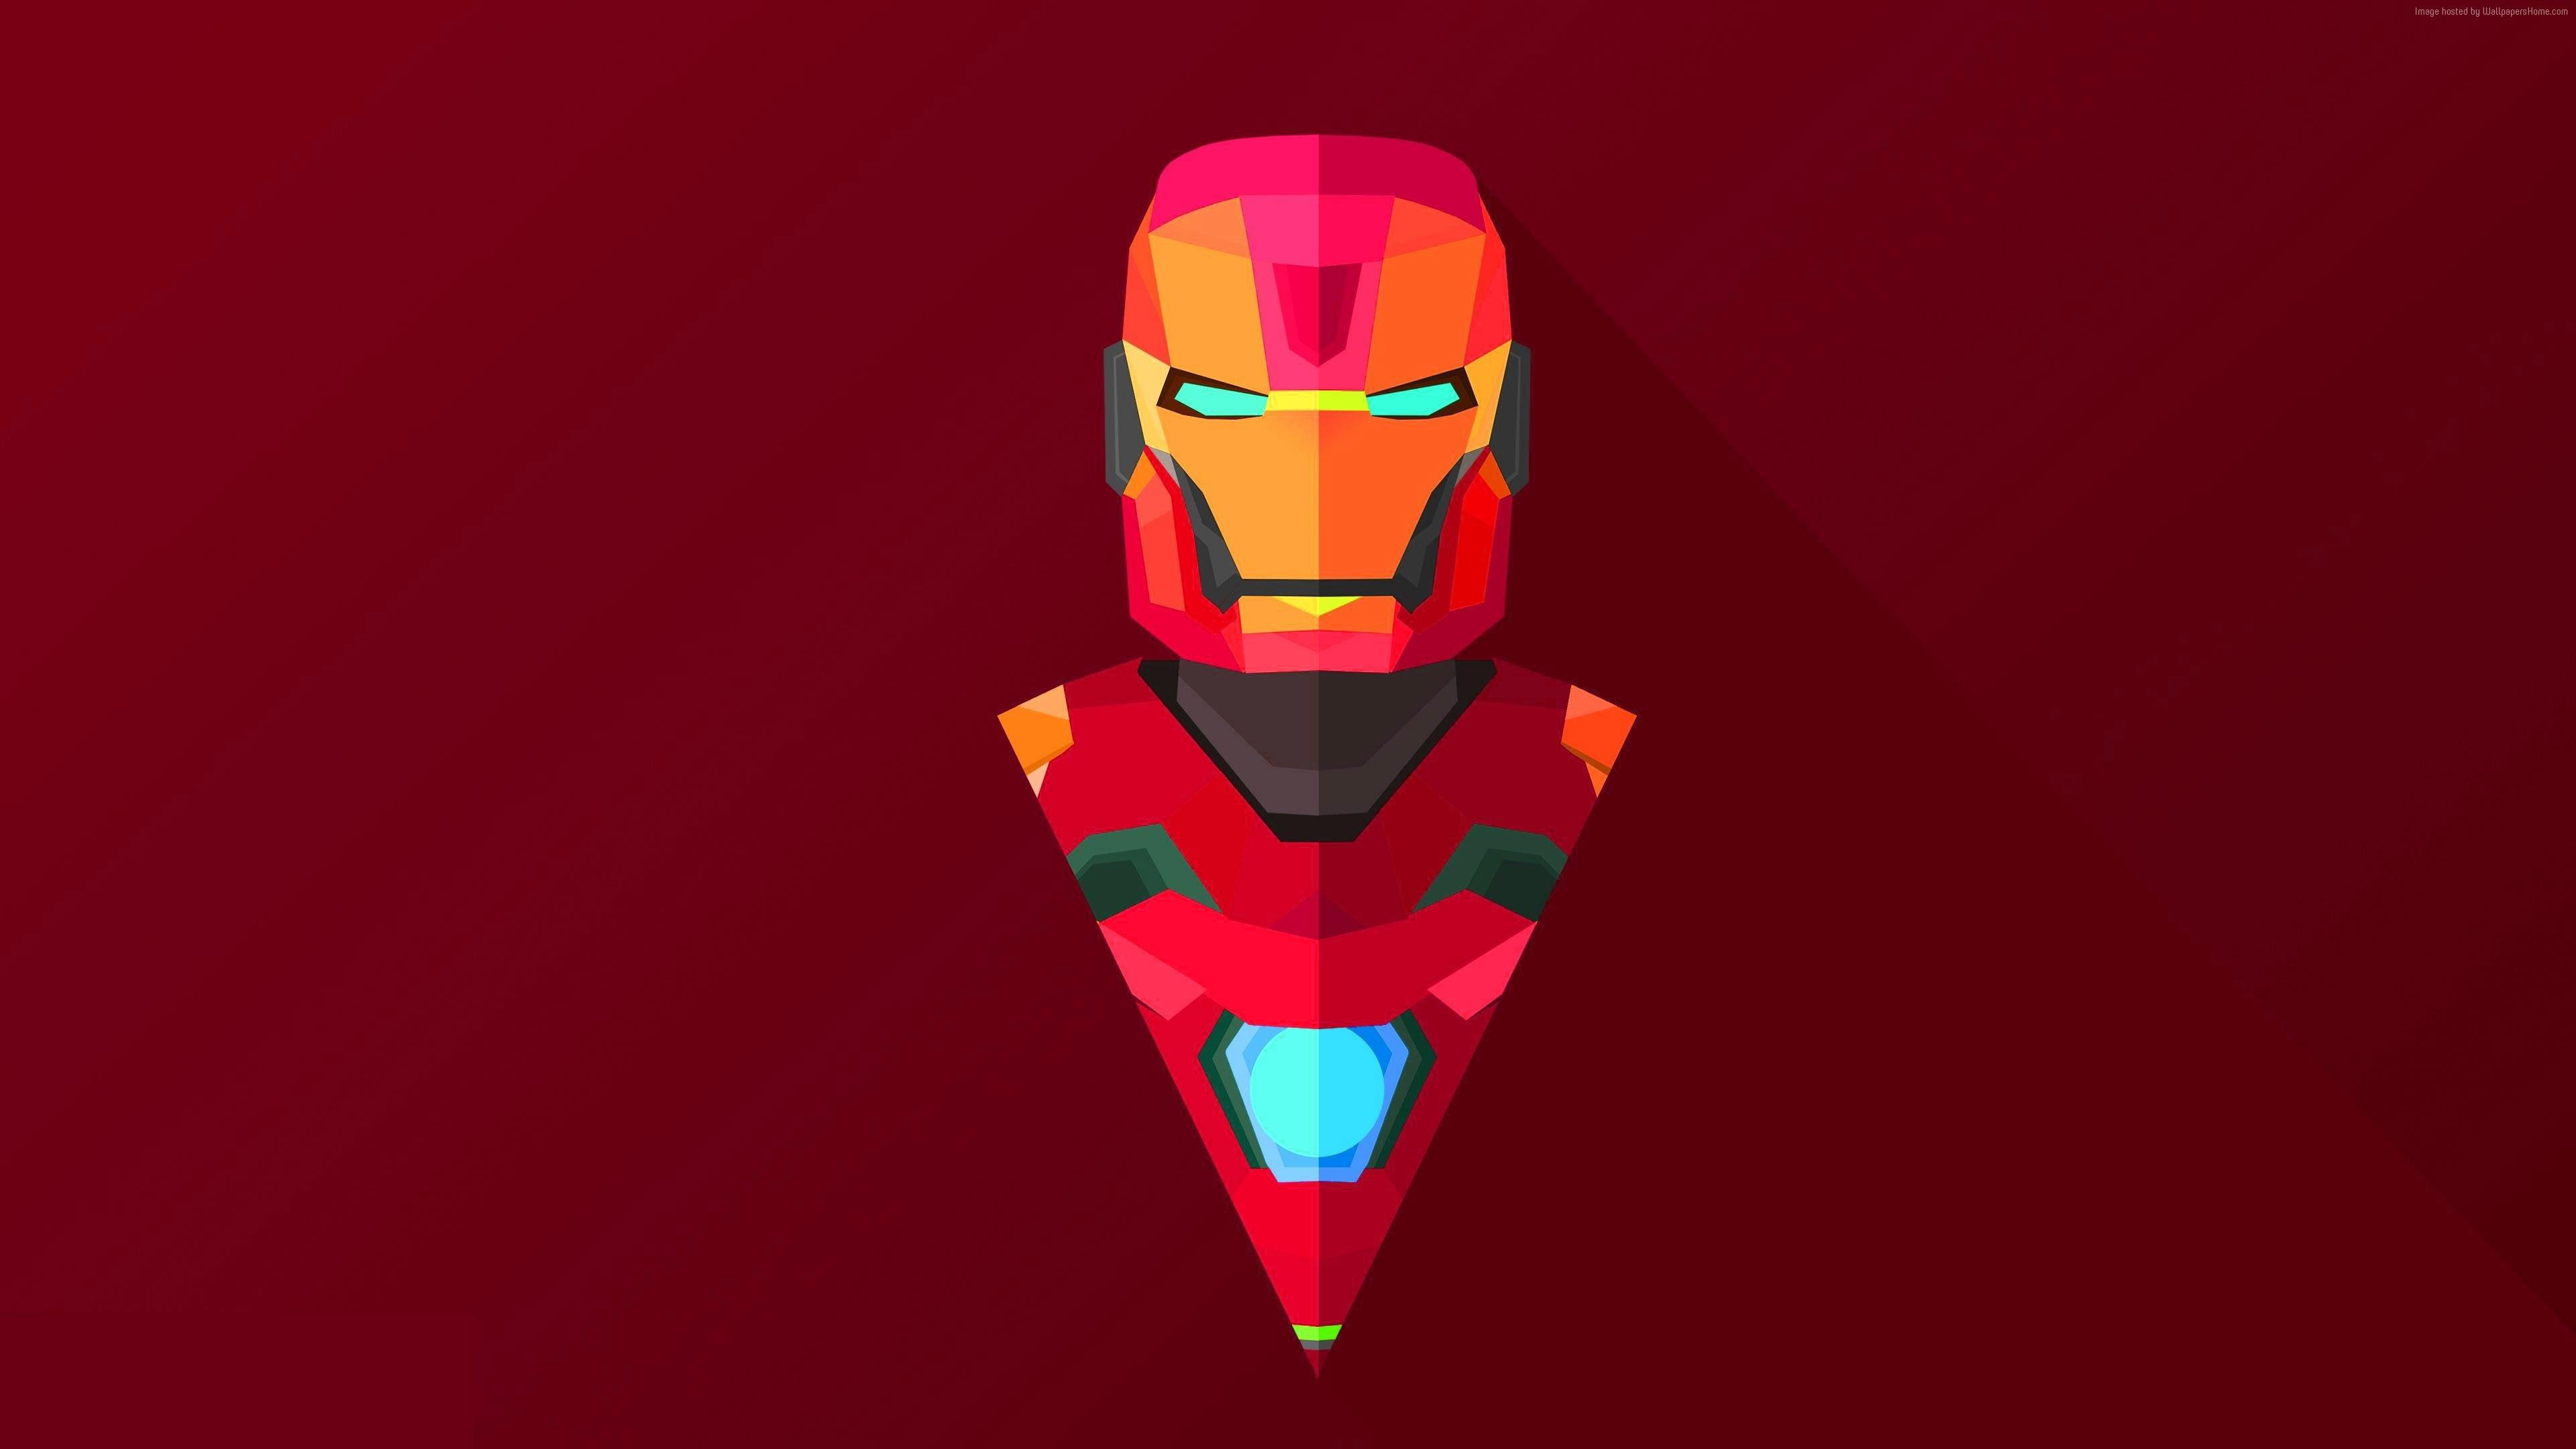 Your Resolution - Iron Man Endgame Wallpaper Hd - HD Wallpaper